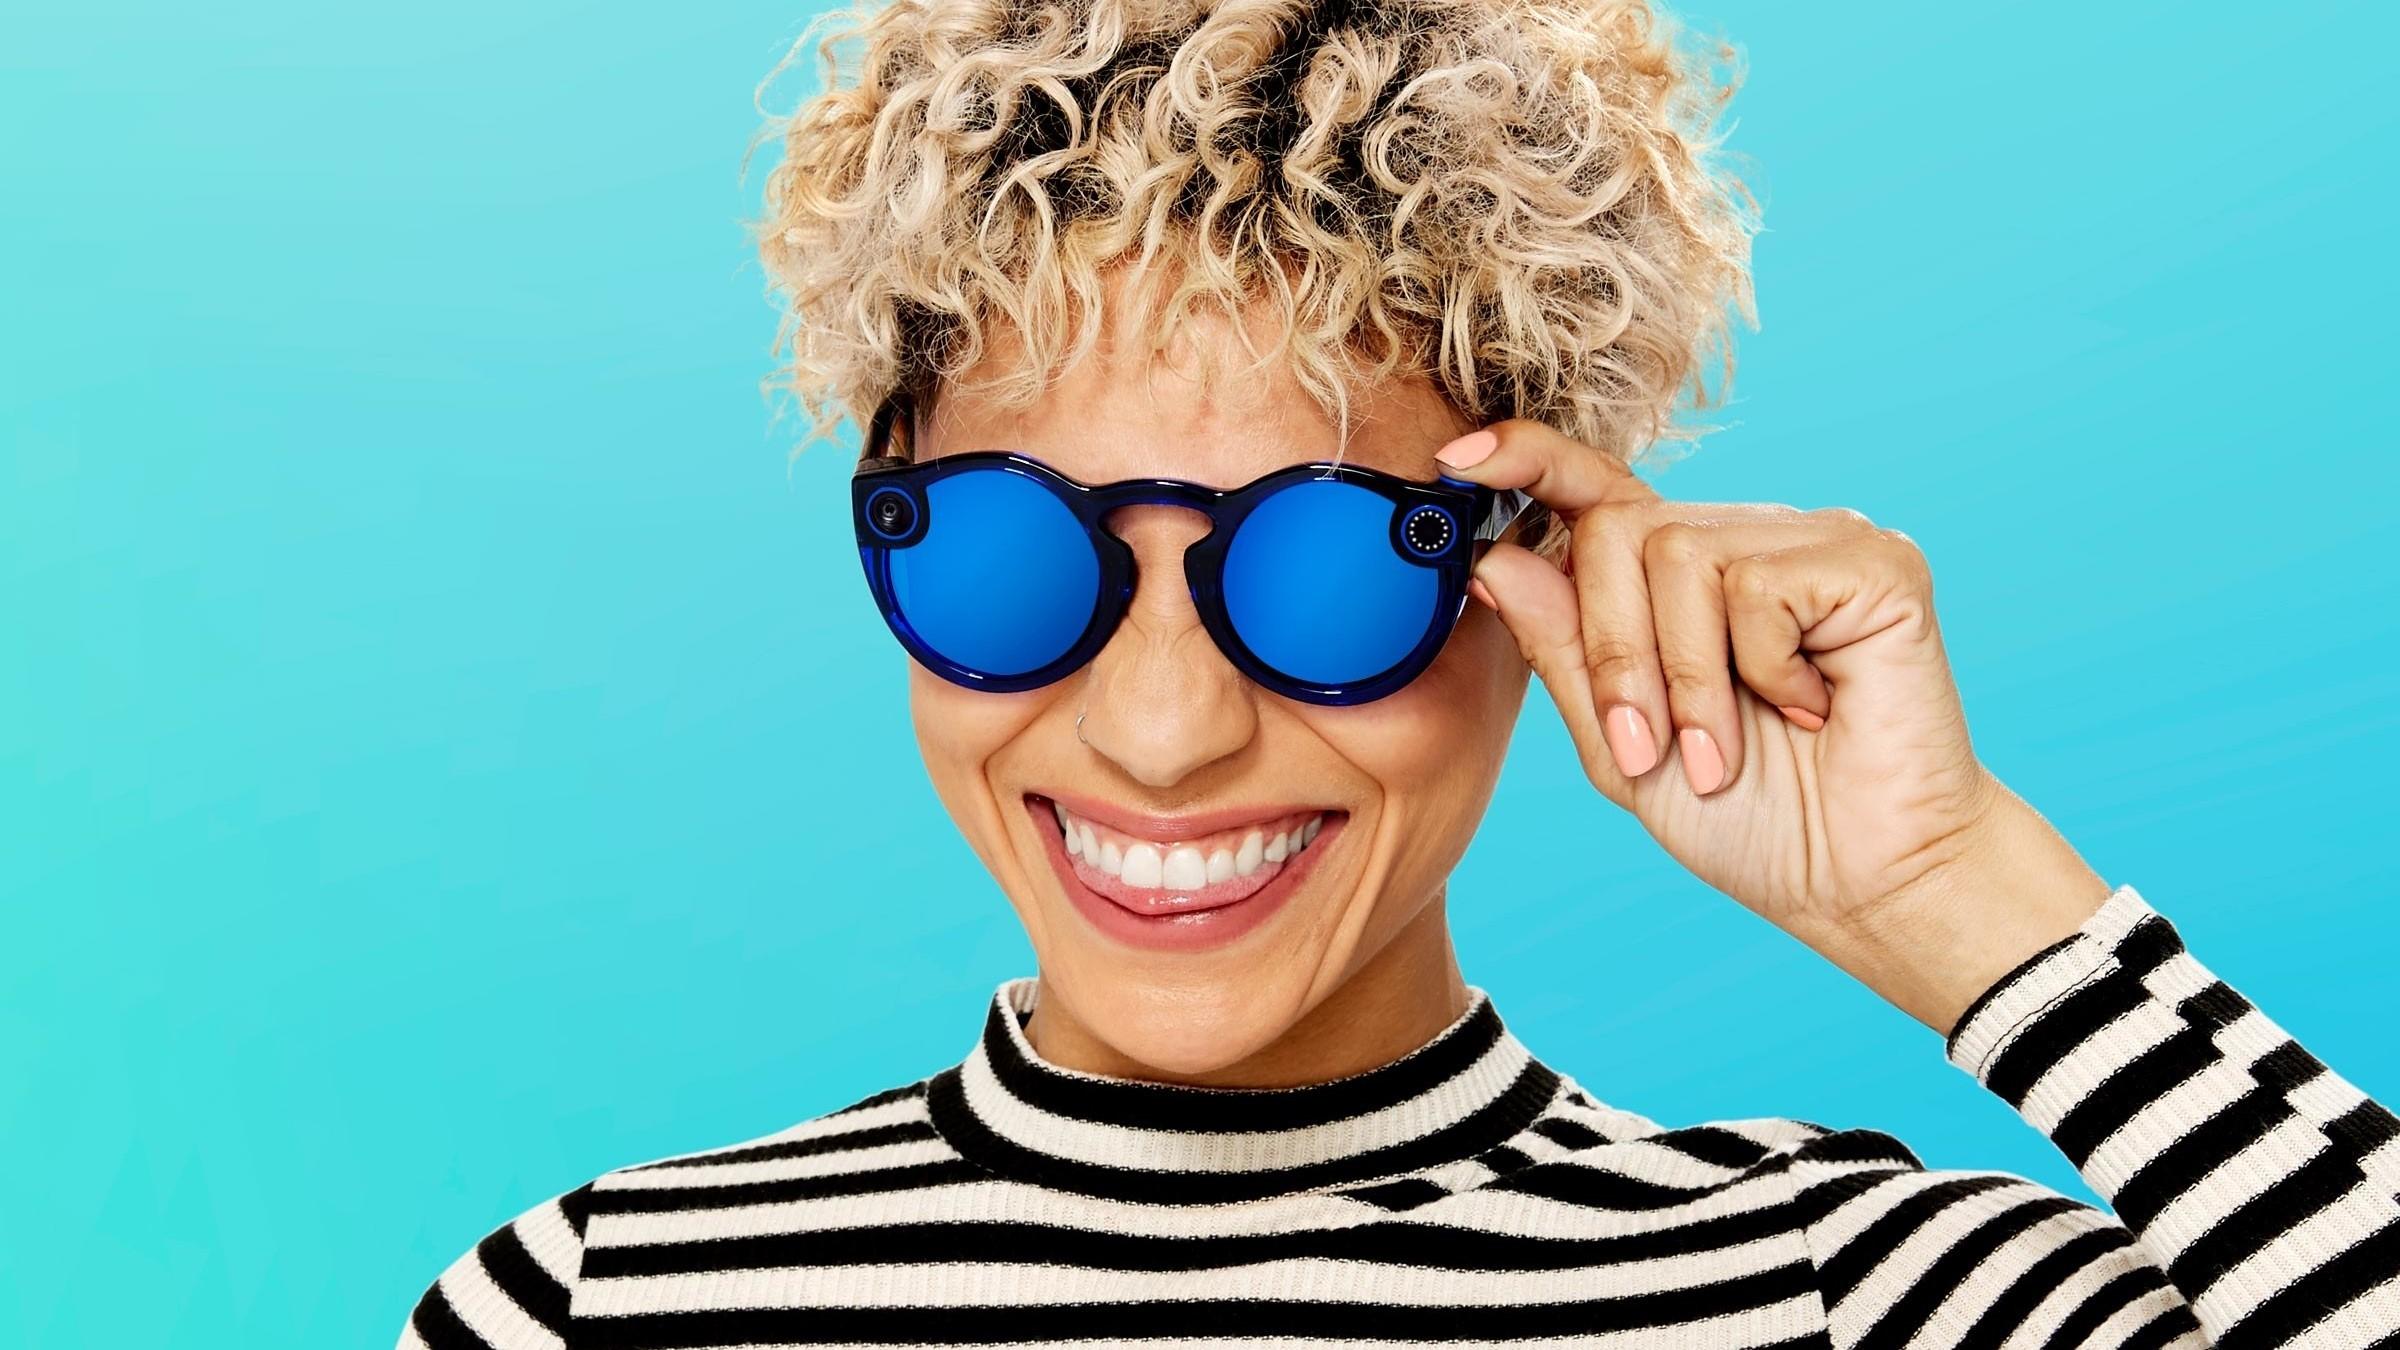 Tencent выпустит конкурента смарт-очкам Snap Spectacles